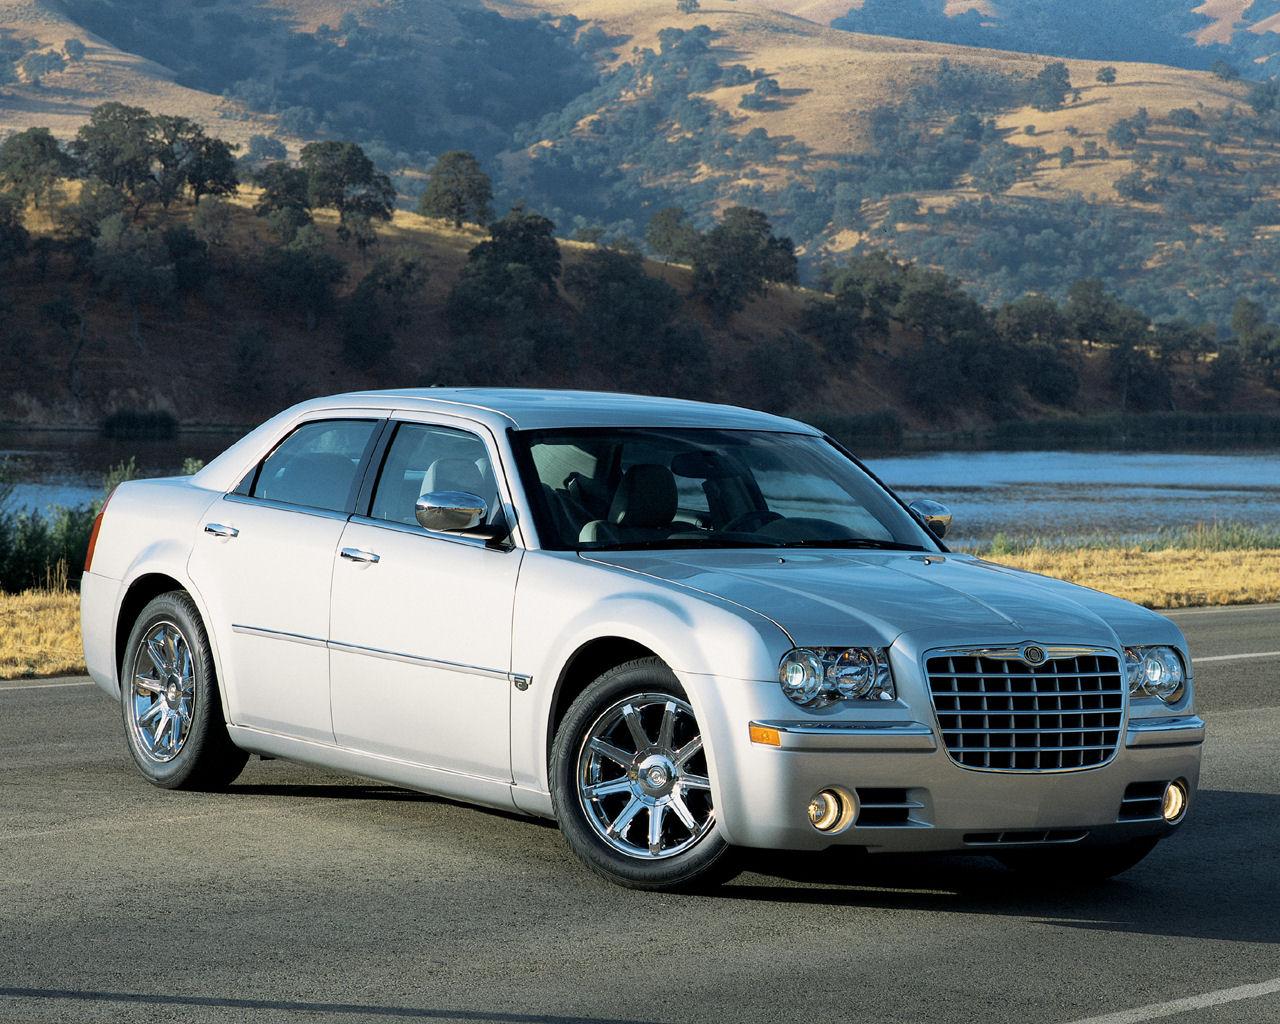 Chrysler 300 Touring Limited 300c Srt8 Free 1280x1024